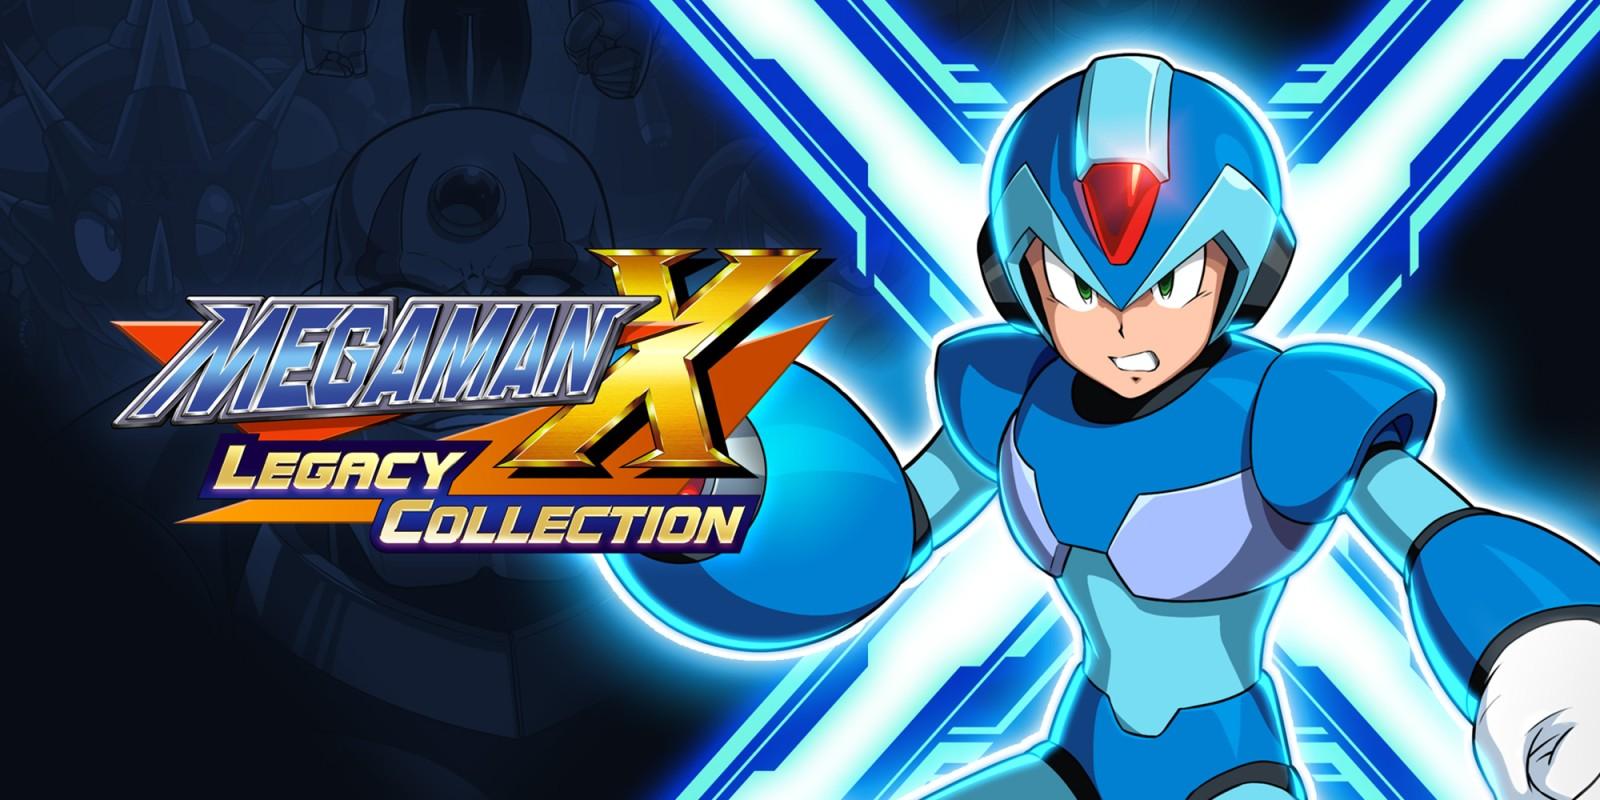 Mega Man 11 vendeu 870 mil cópias entre todas as plataformas; Mega Man X Legacy Collection 1+2 vendeu 900 mil cópias